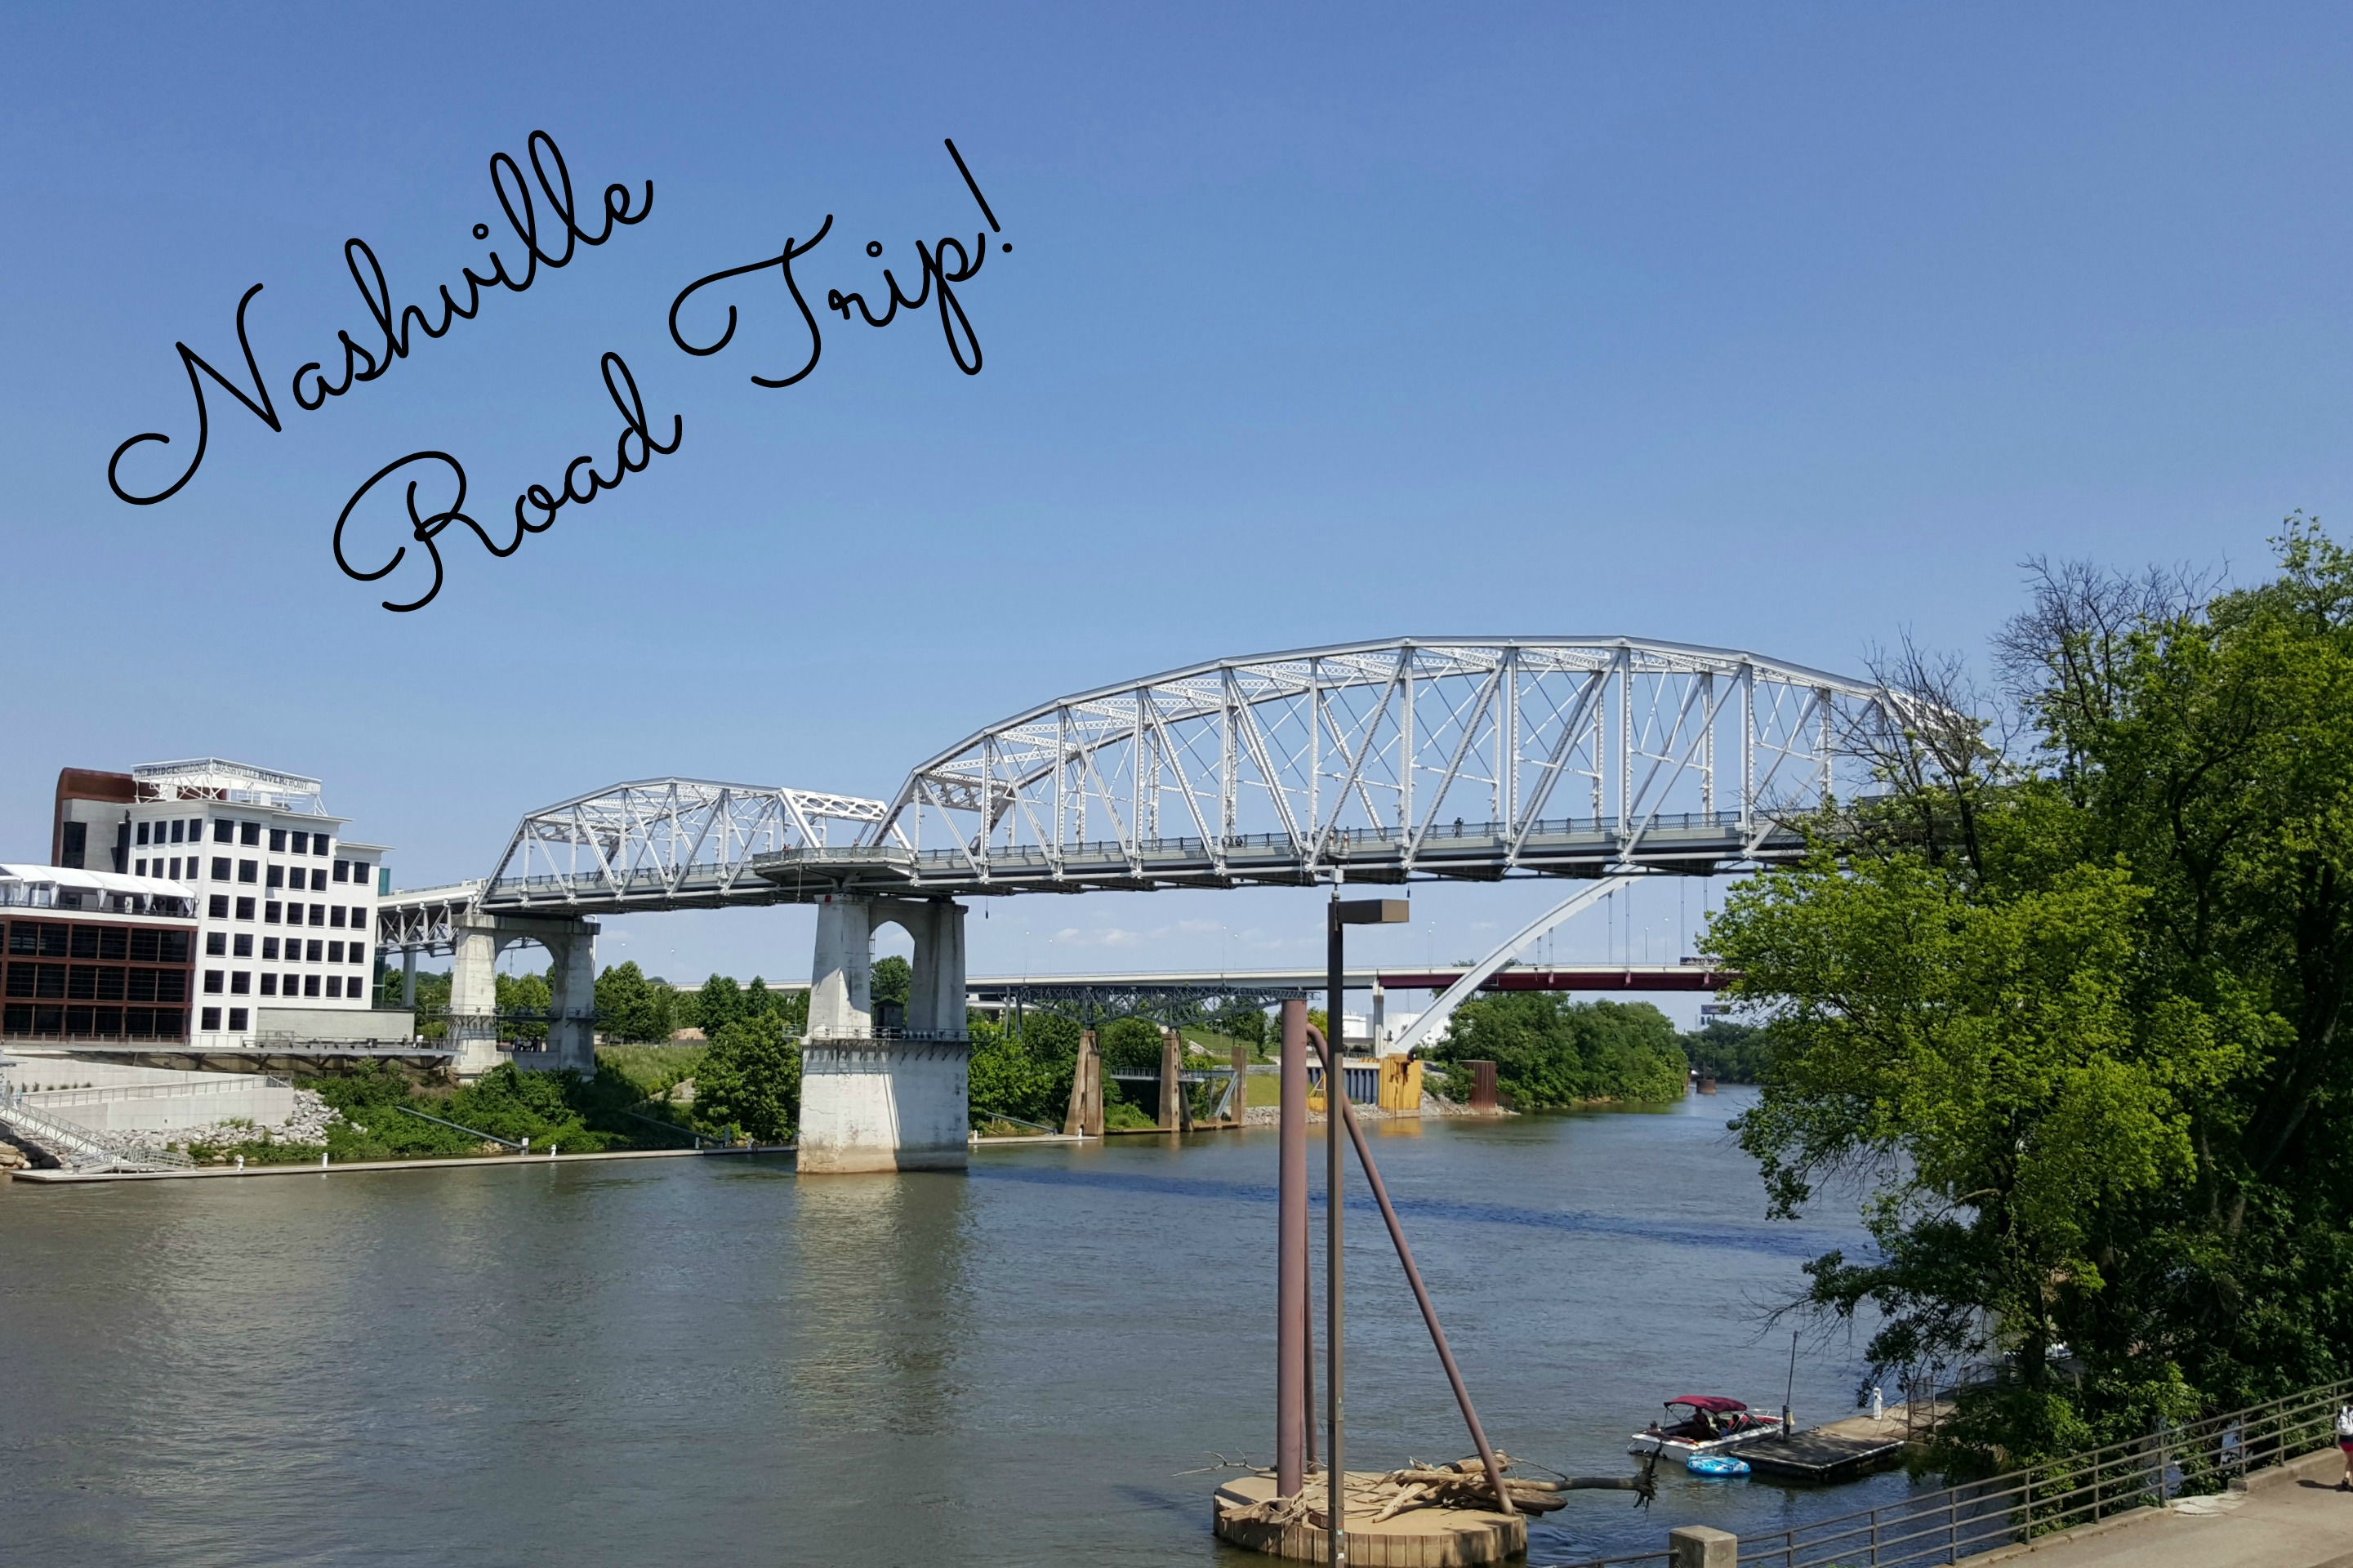 Seigenthaler Pedestrian Bridge (Shelby Avenue) Nashville